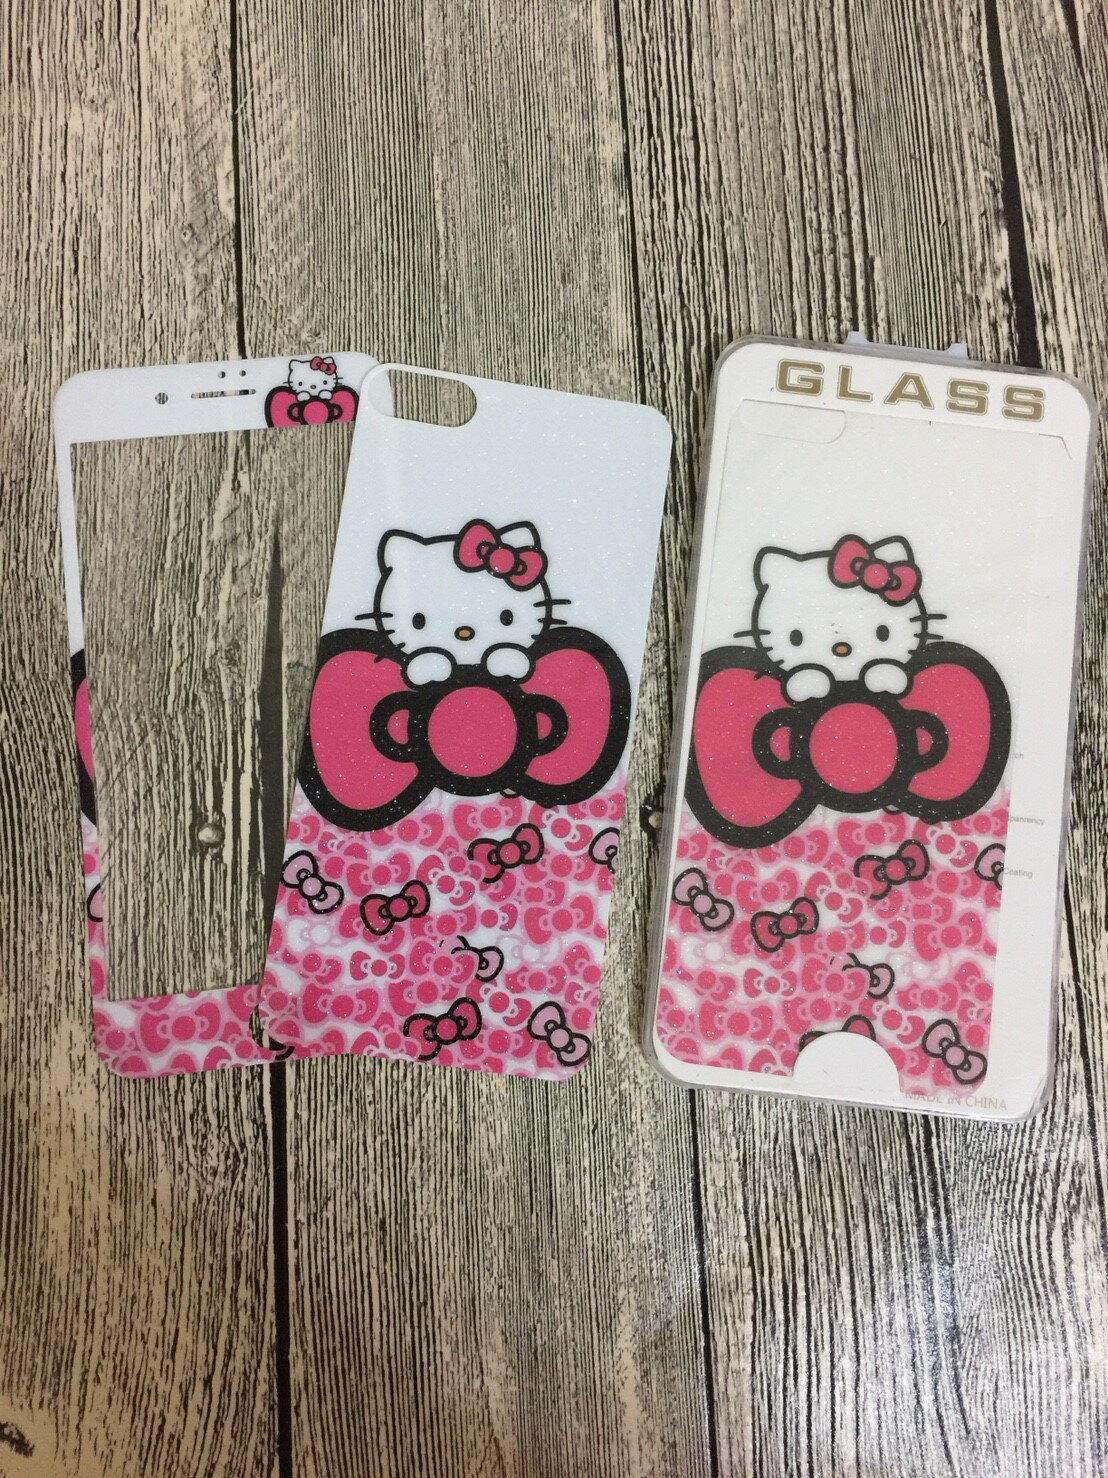 iPhone i6 I6s i6plus i7 i7plus kitty 卡通保護貼 海報版 全屏保護貼 3D卡通 超薄9h鋼化膜 彩膜 手機螢幕貼【GP美貼】